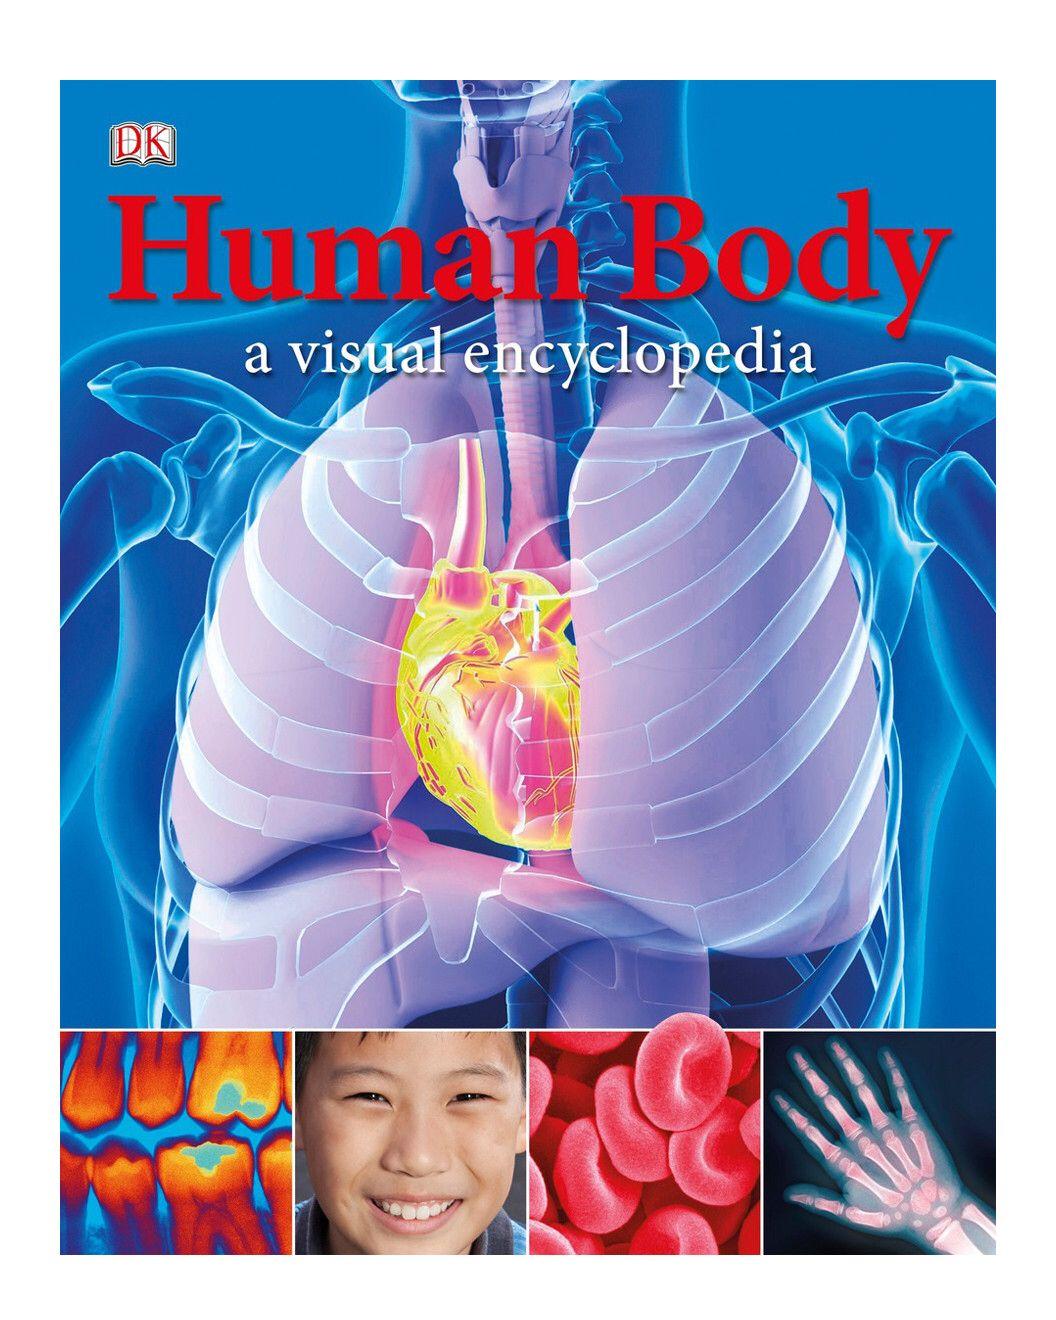 The Human Body A Visual Encyclopedia